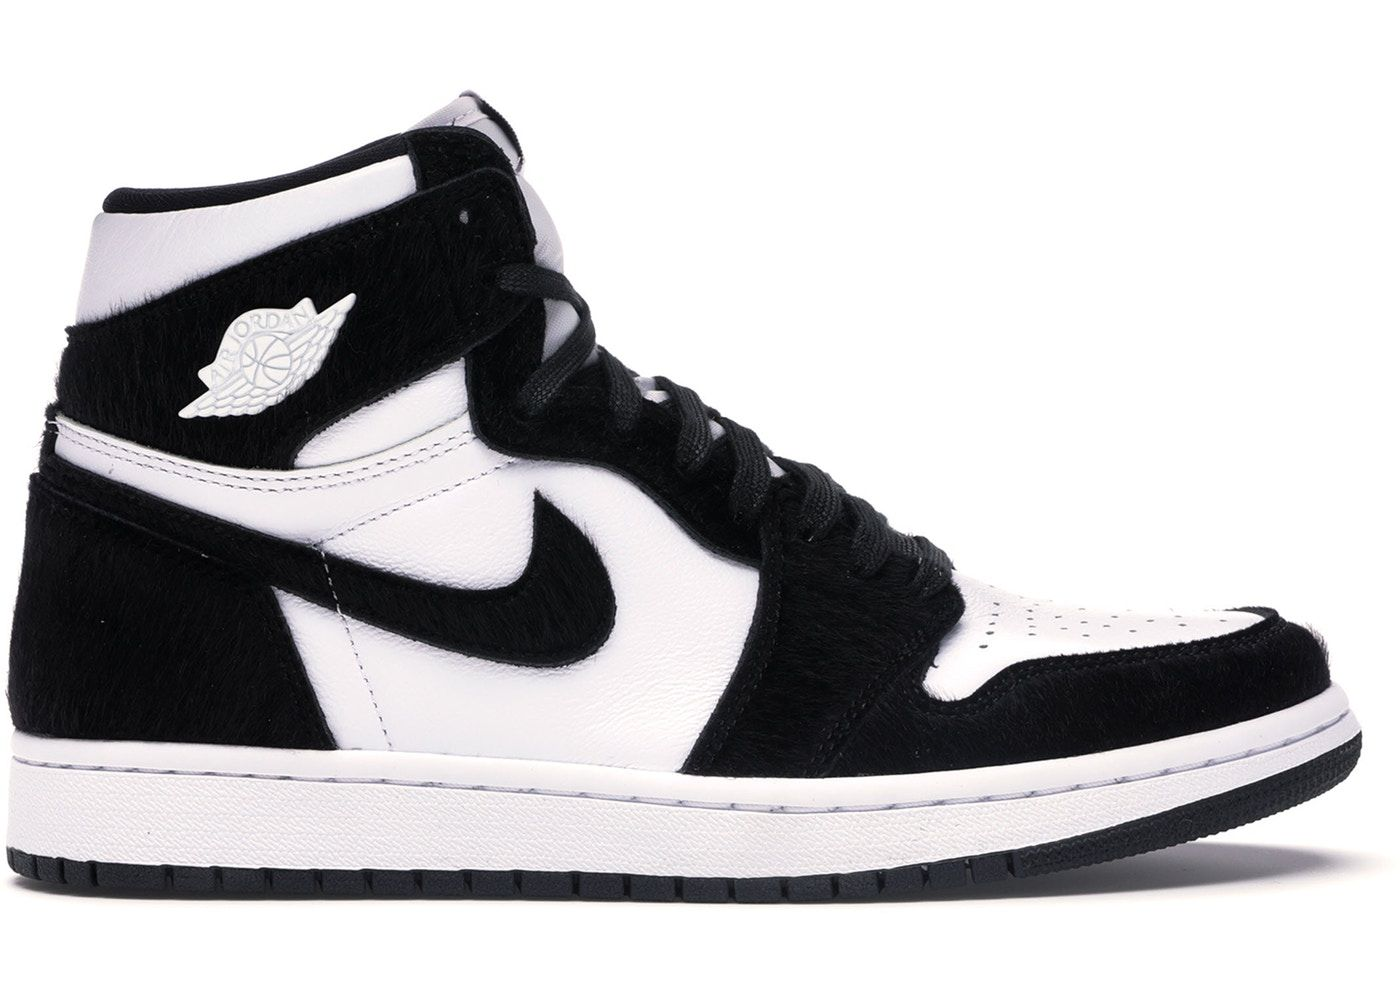 Jordan 1 Retro High Twist (W) | Jordan shoes girls, Nike ...